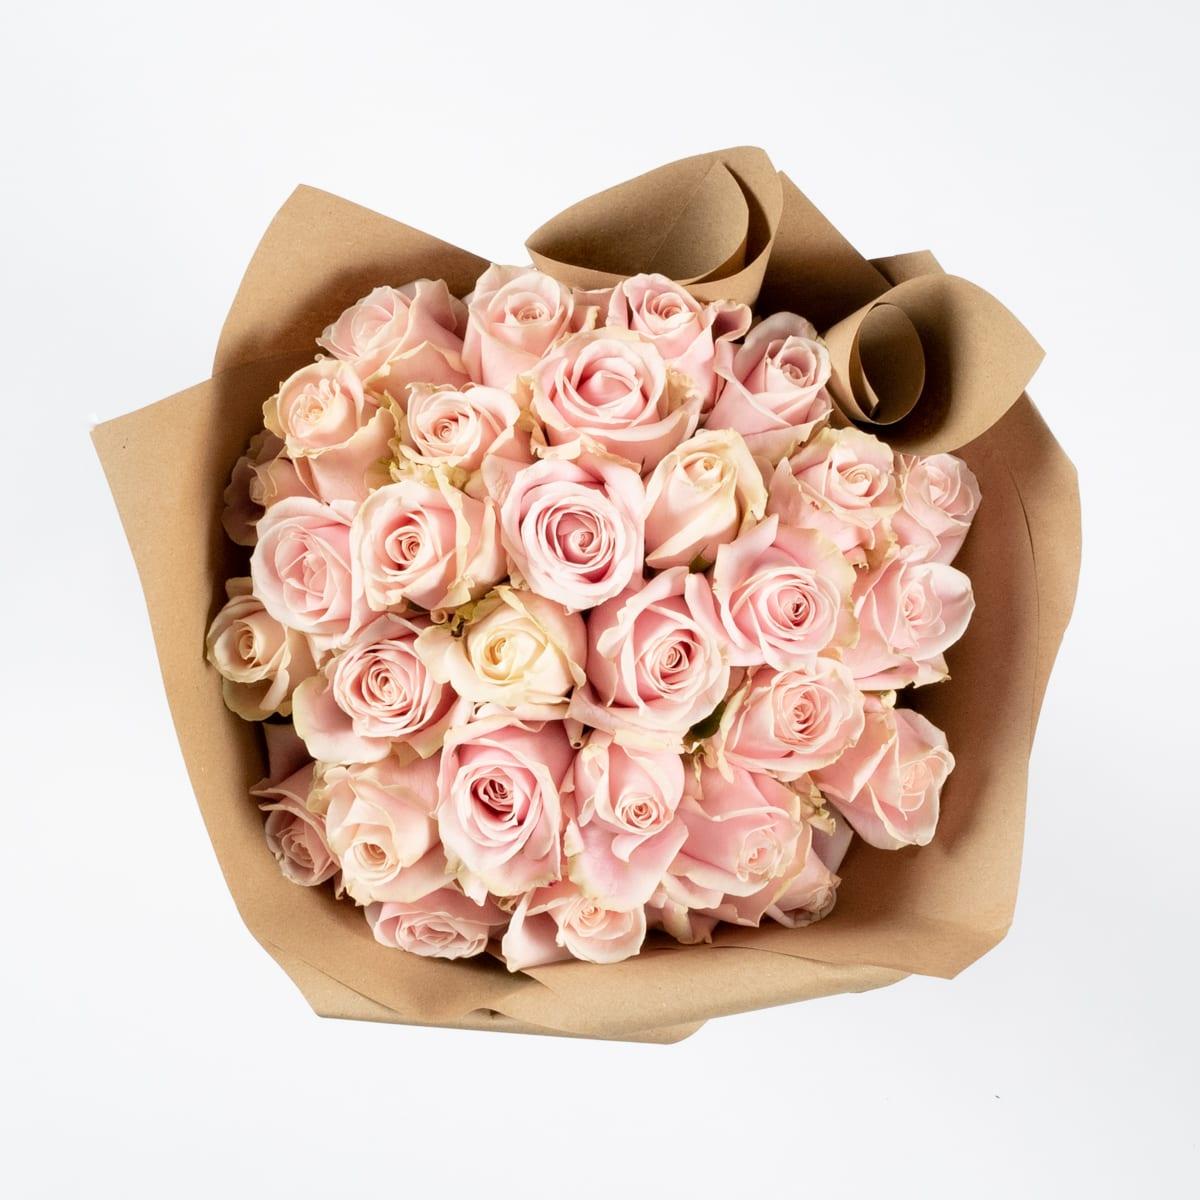 Bloom Flower Delivery | Belgrave Bouquet